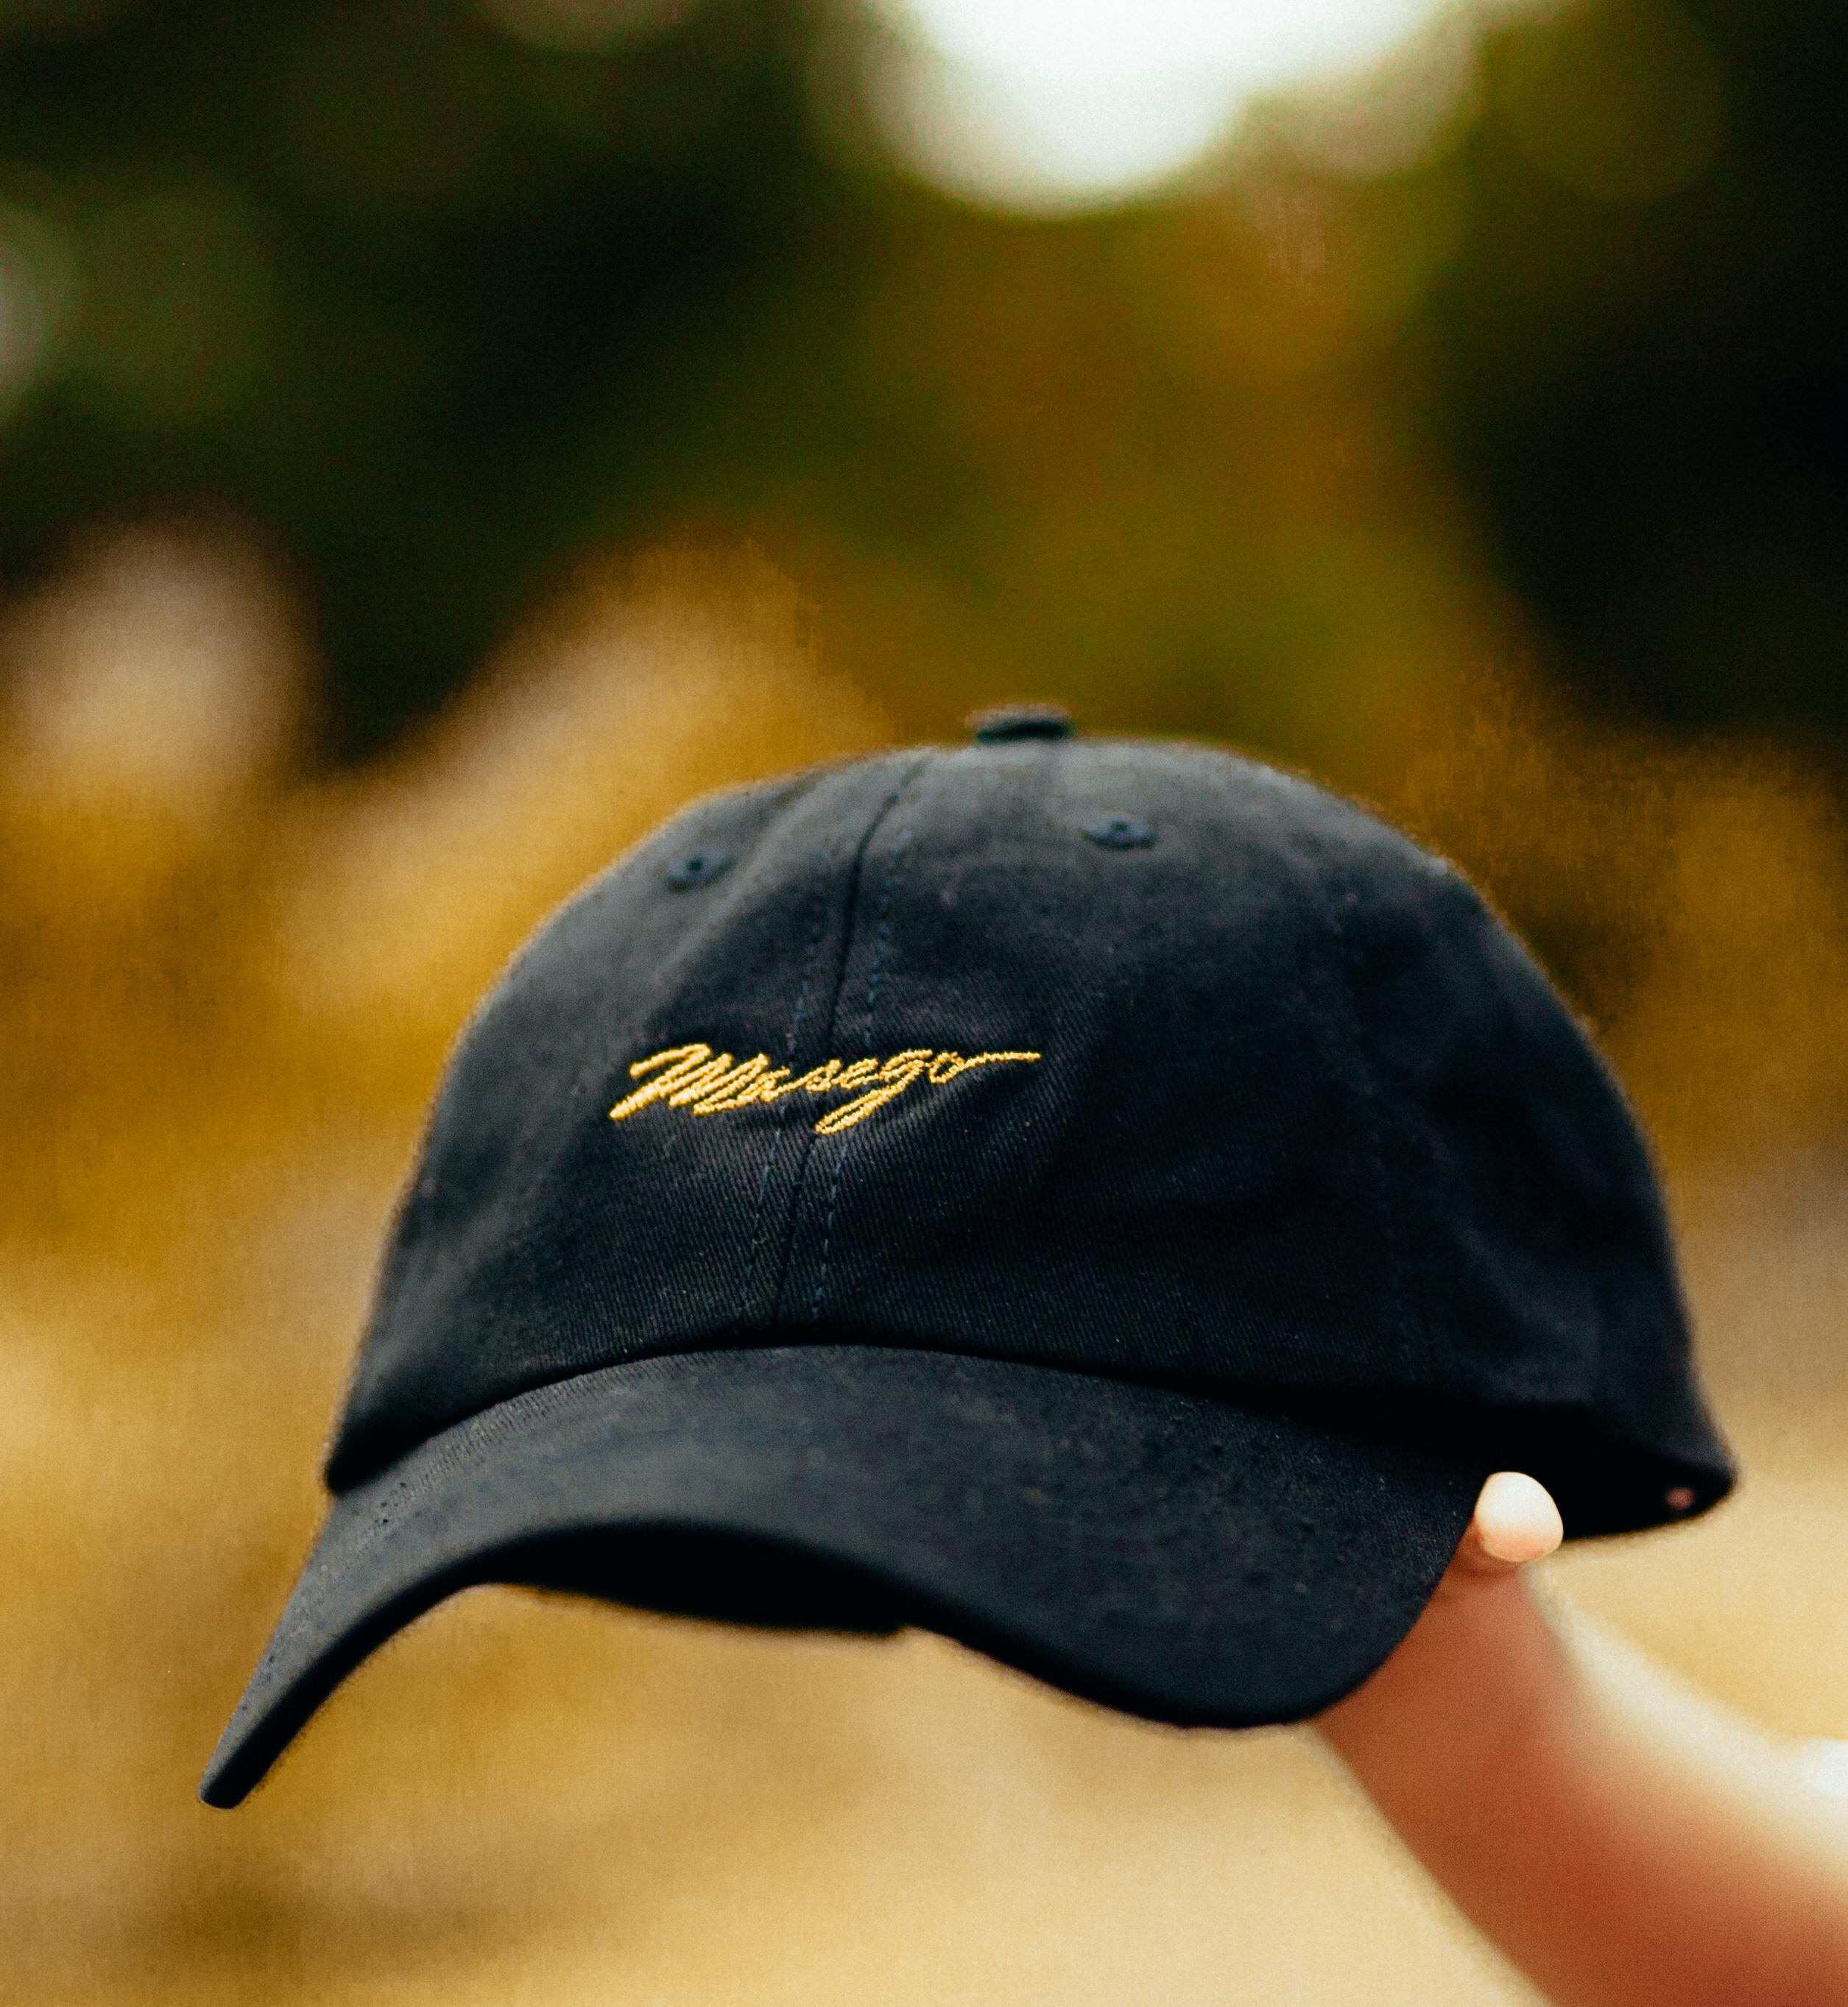 Masego Hat